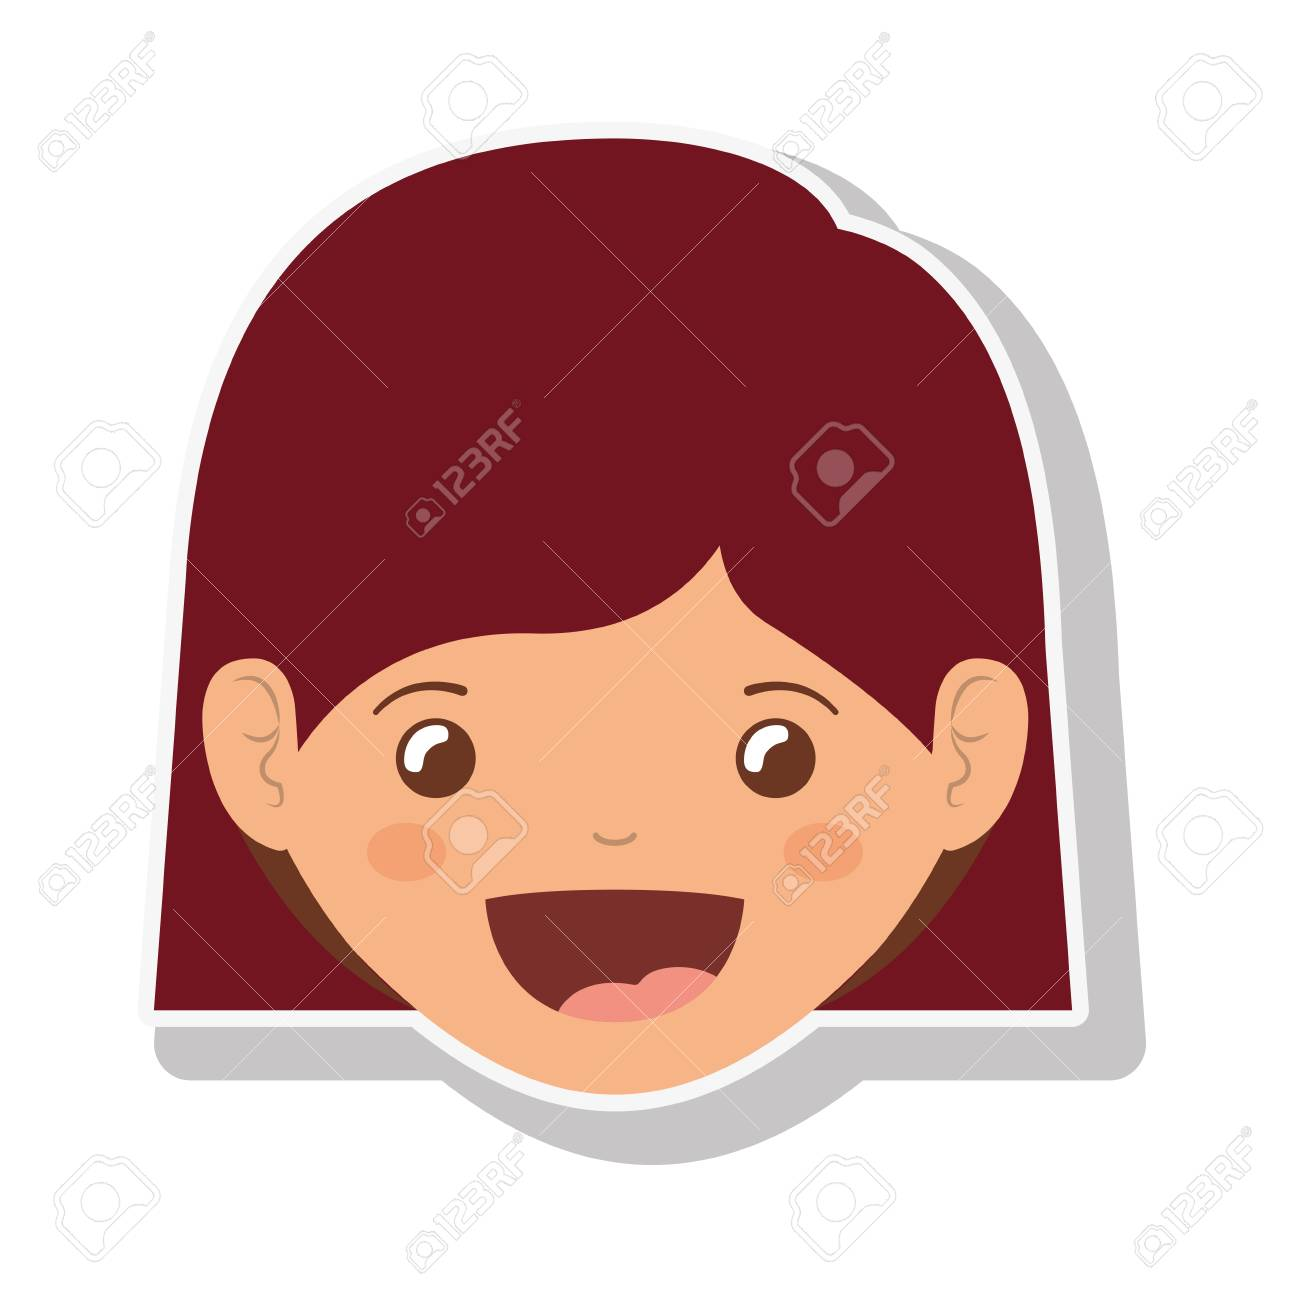 Cara De Niña De Dibujos Animados Sonriendo Icono De Niño Feliz